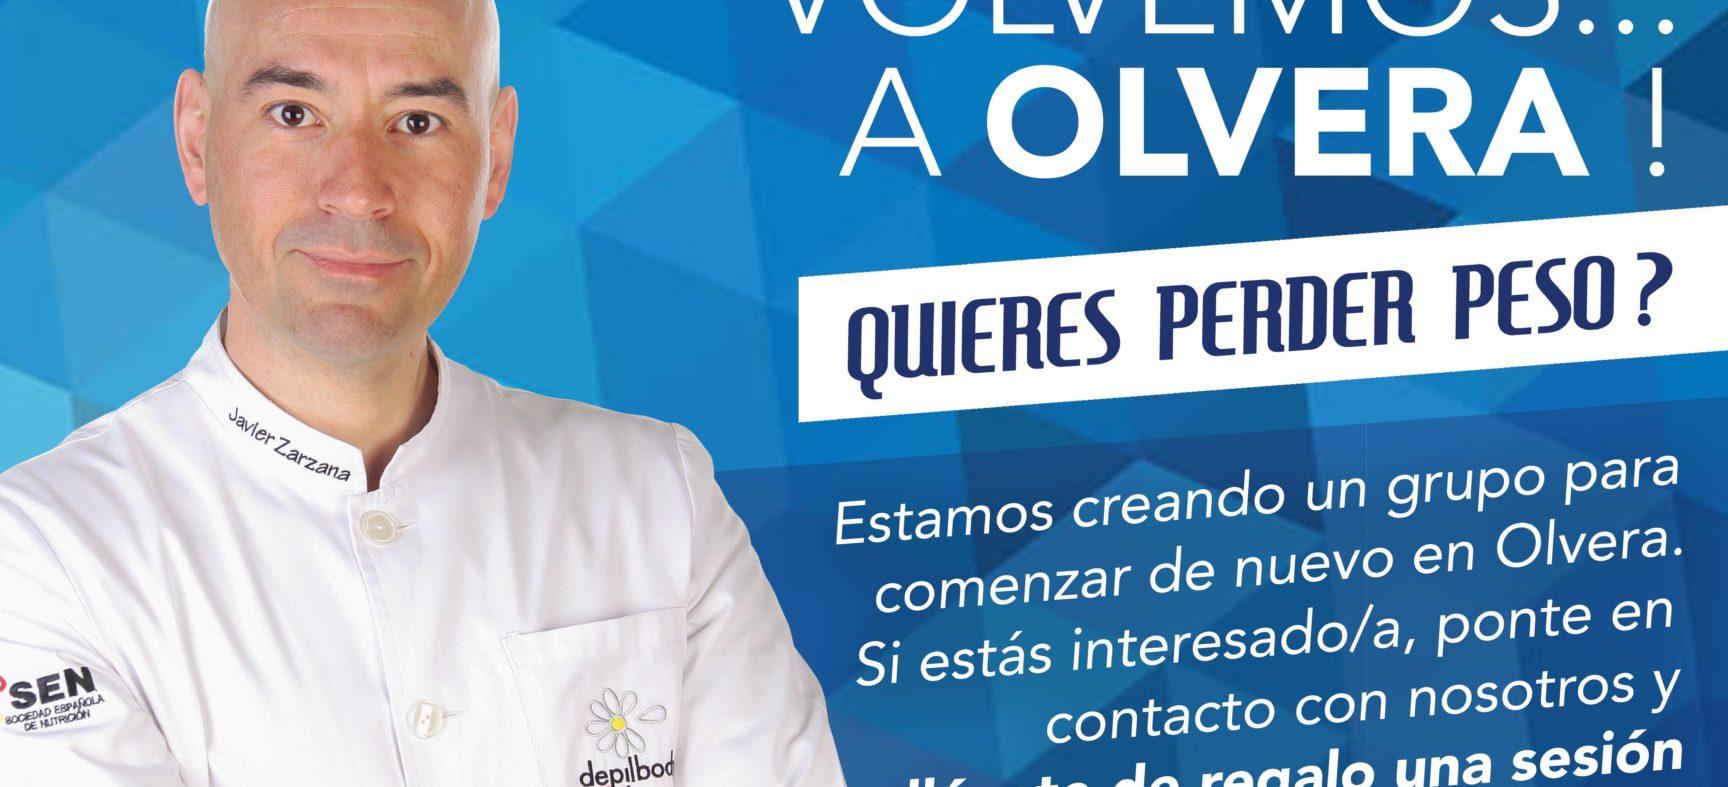 VOLVEMOS A OLVERA (Consulta de Nutrición)